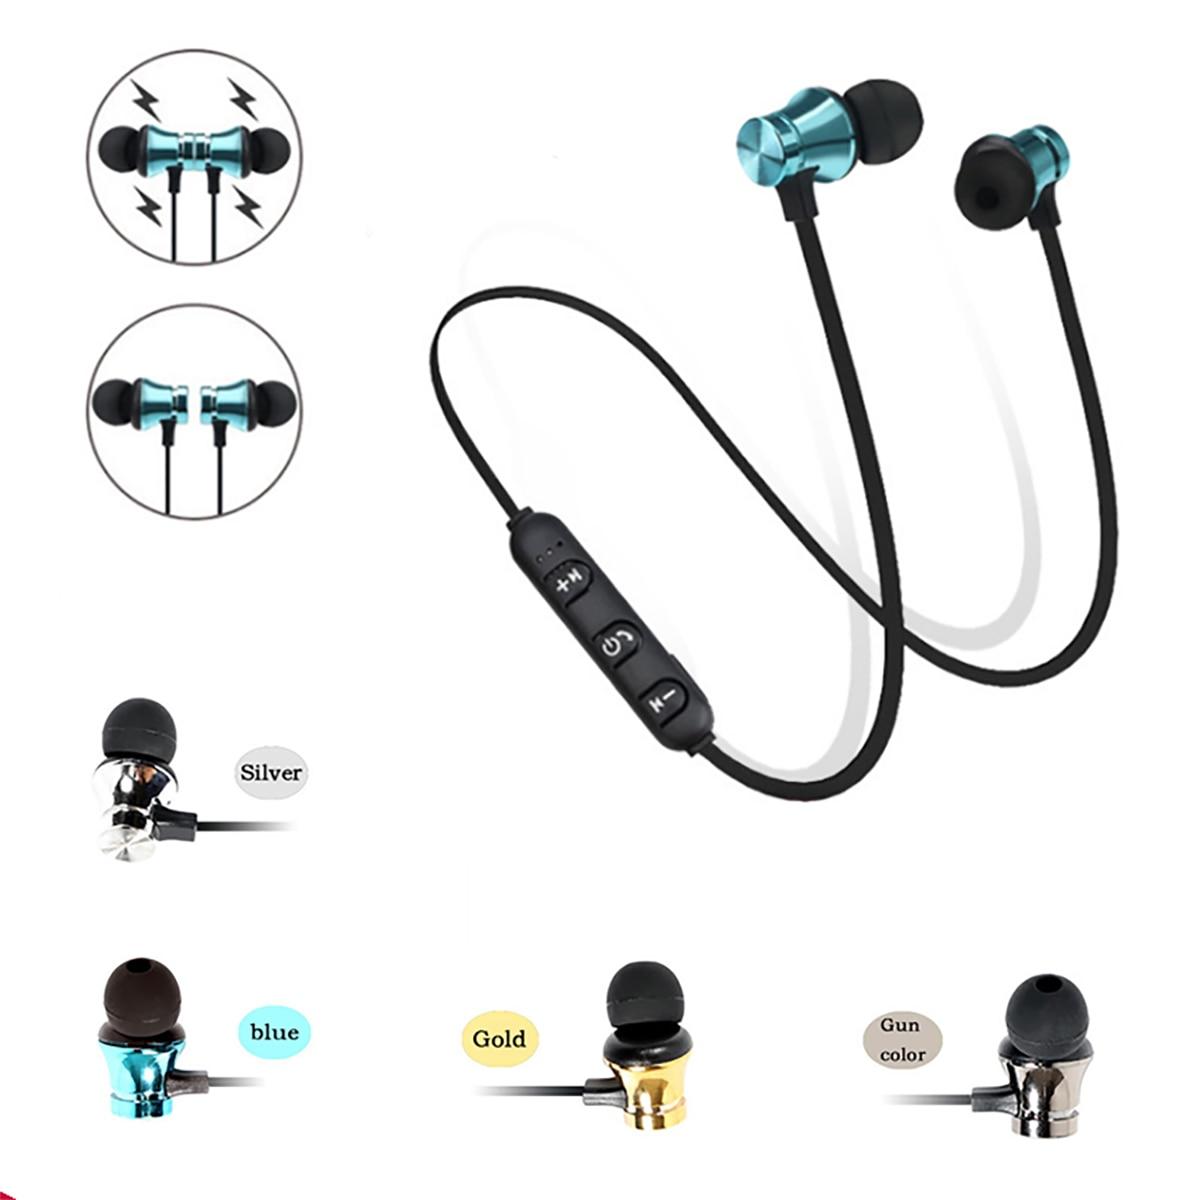 Bluetooth Earphone Sport Handsfree Headphones Wireless Earphones Magnetic Headset With Microphone For IPhones Xiaomi Android LG